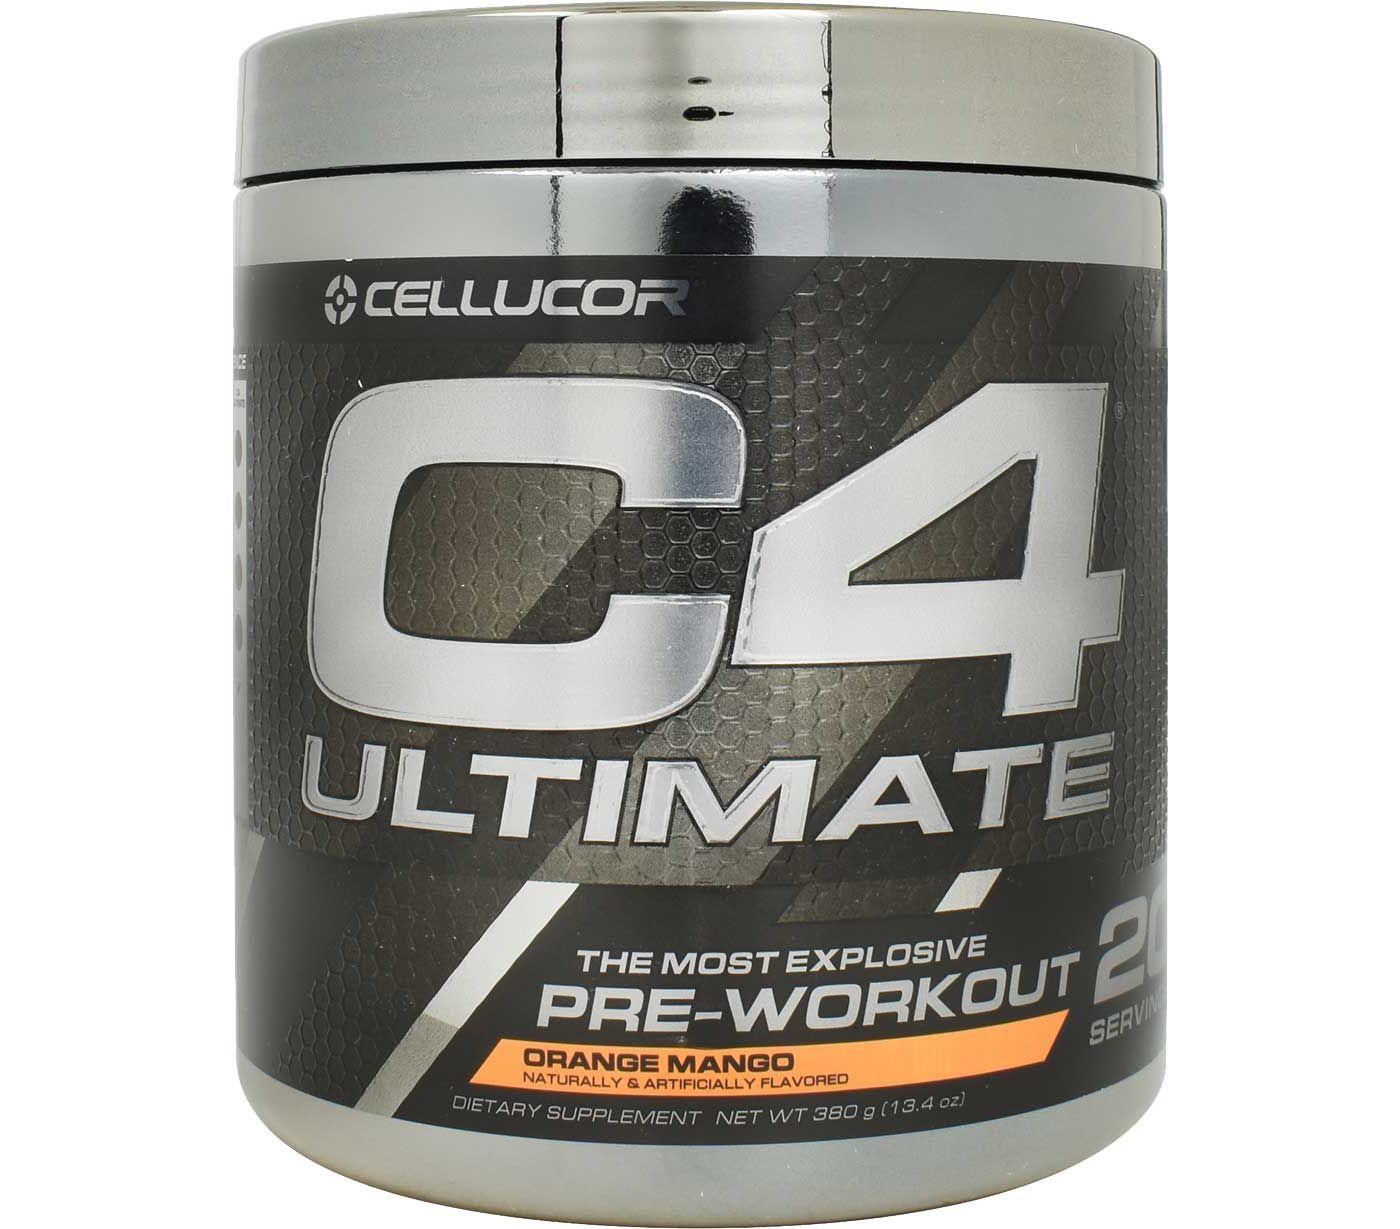 Cellucor C4 Ultimate Pre-Workout Orange Mango 20 Servings